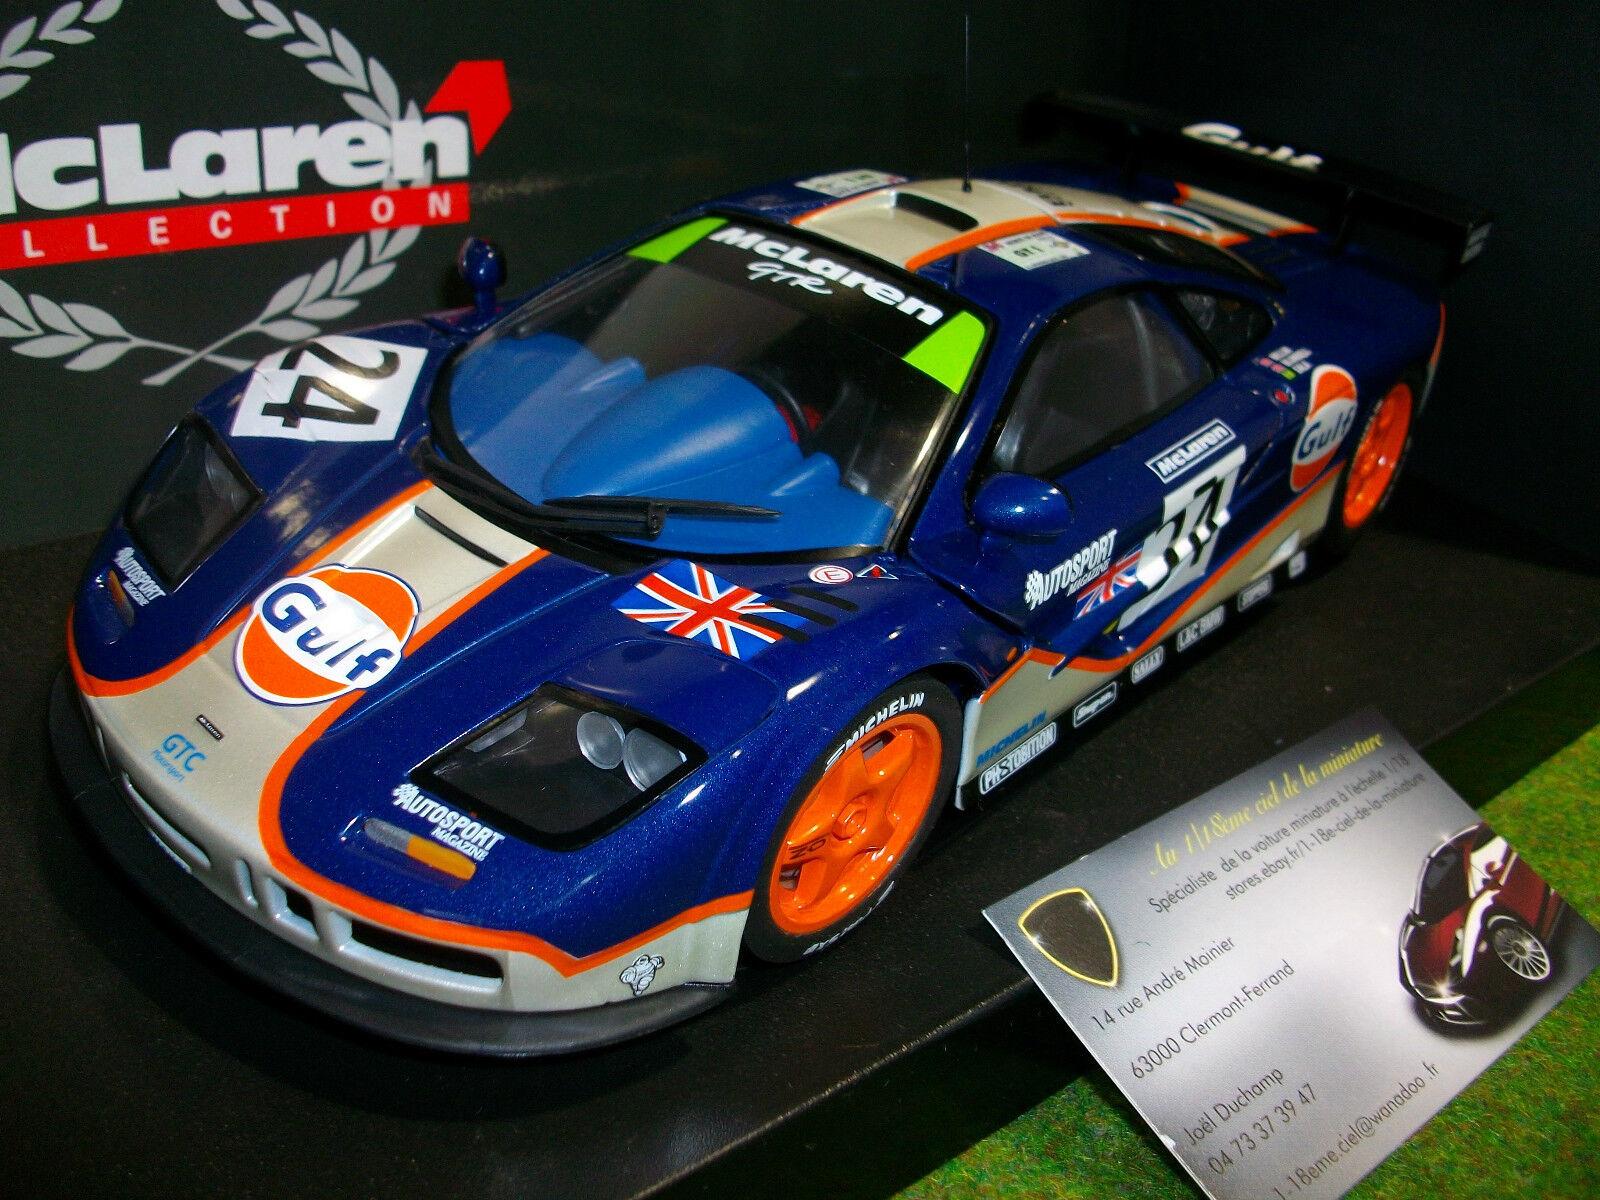 McLAREN F1 GTR  24 GULF 4th LE MANS blu au 1 18 UT MODELS 530151824 voiture